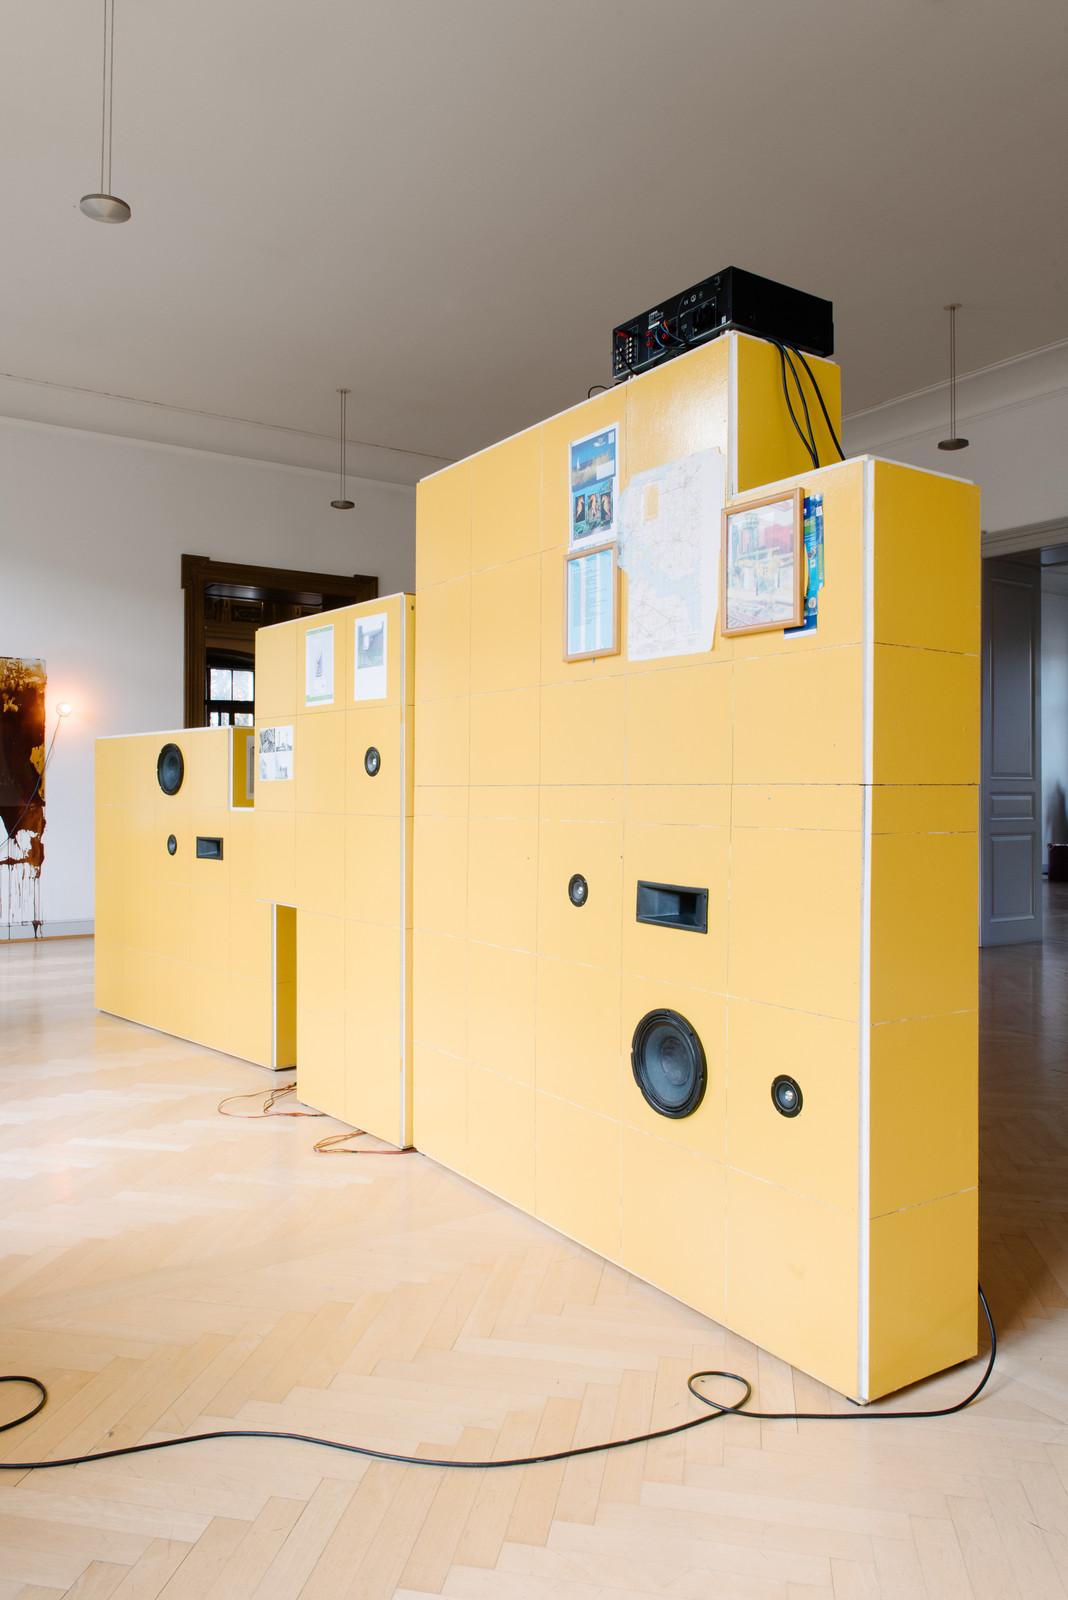 17_Installationsansicht_St.Gallen__Foto_Sebastian_Stadler